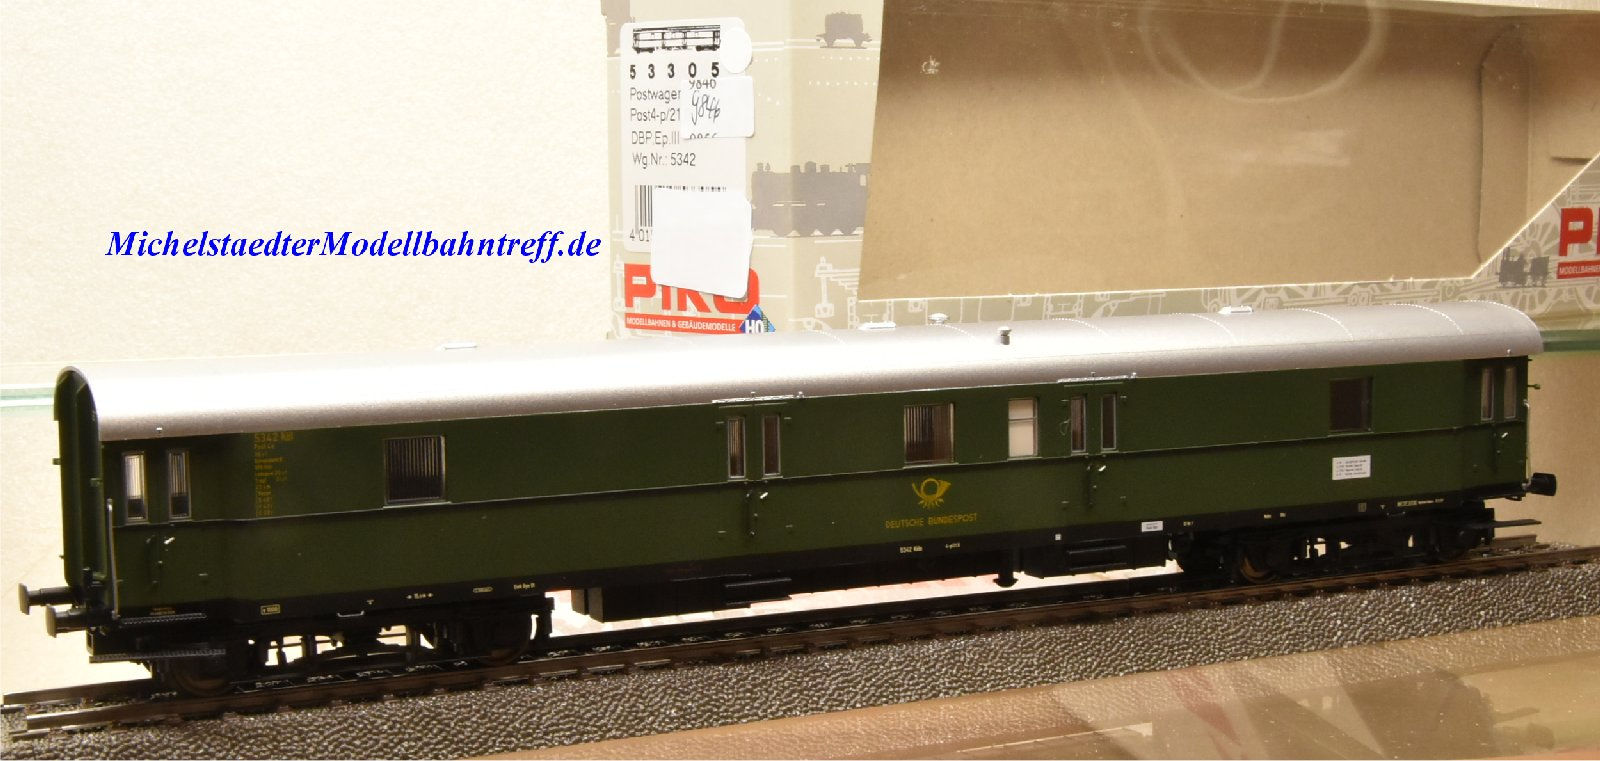 Piko 53305 Postwagen der DBP, Ep.III, (9846)